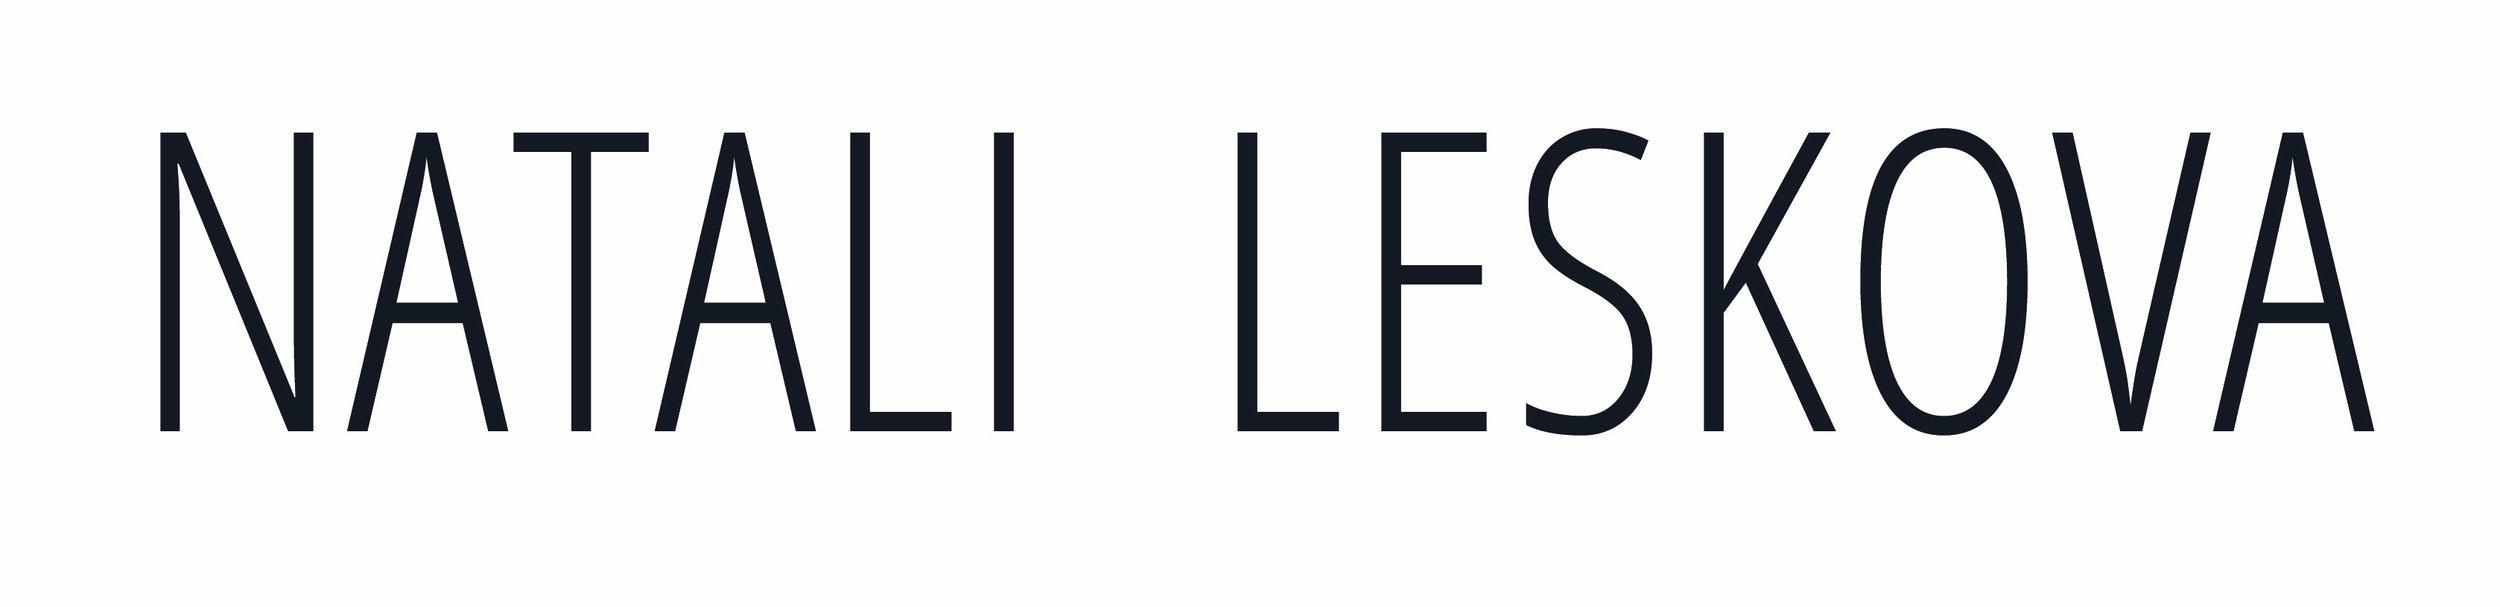 natali leskova logo.jpg